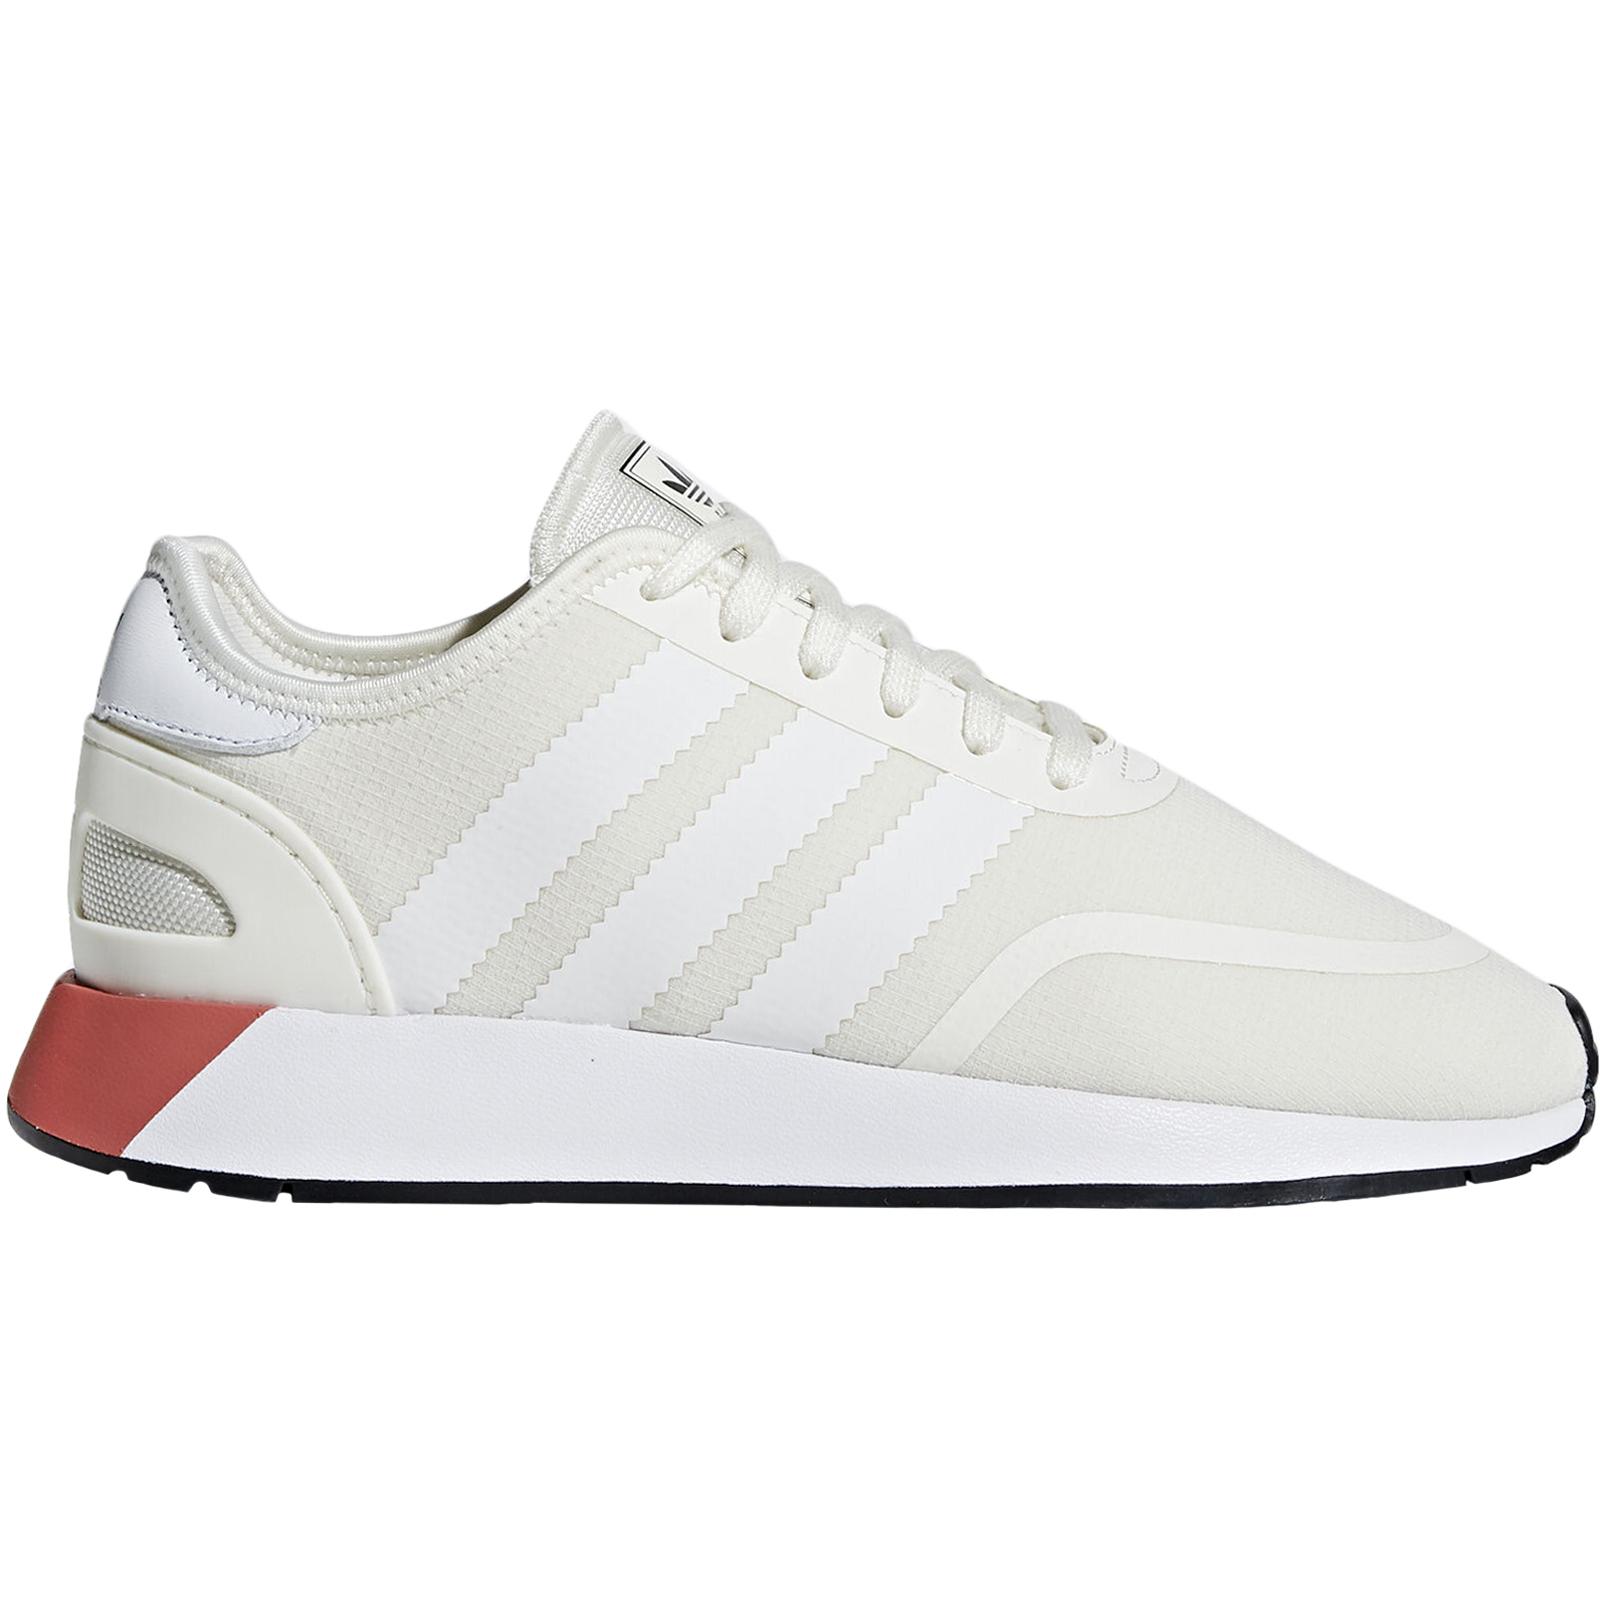 5923 Damen Adidas Schuhe Sneaker Freizeit Women Originals N